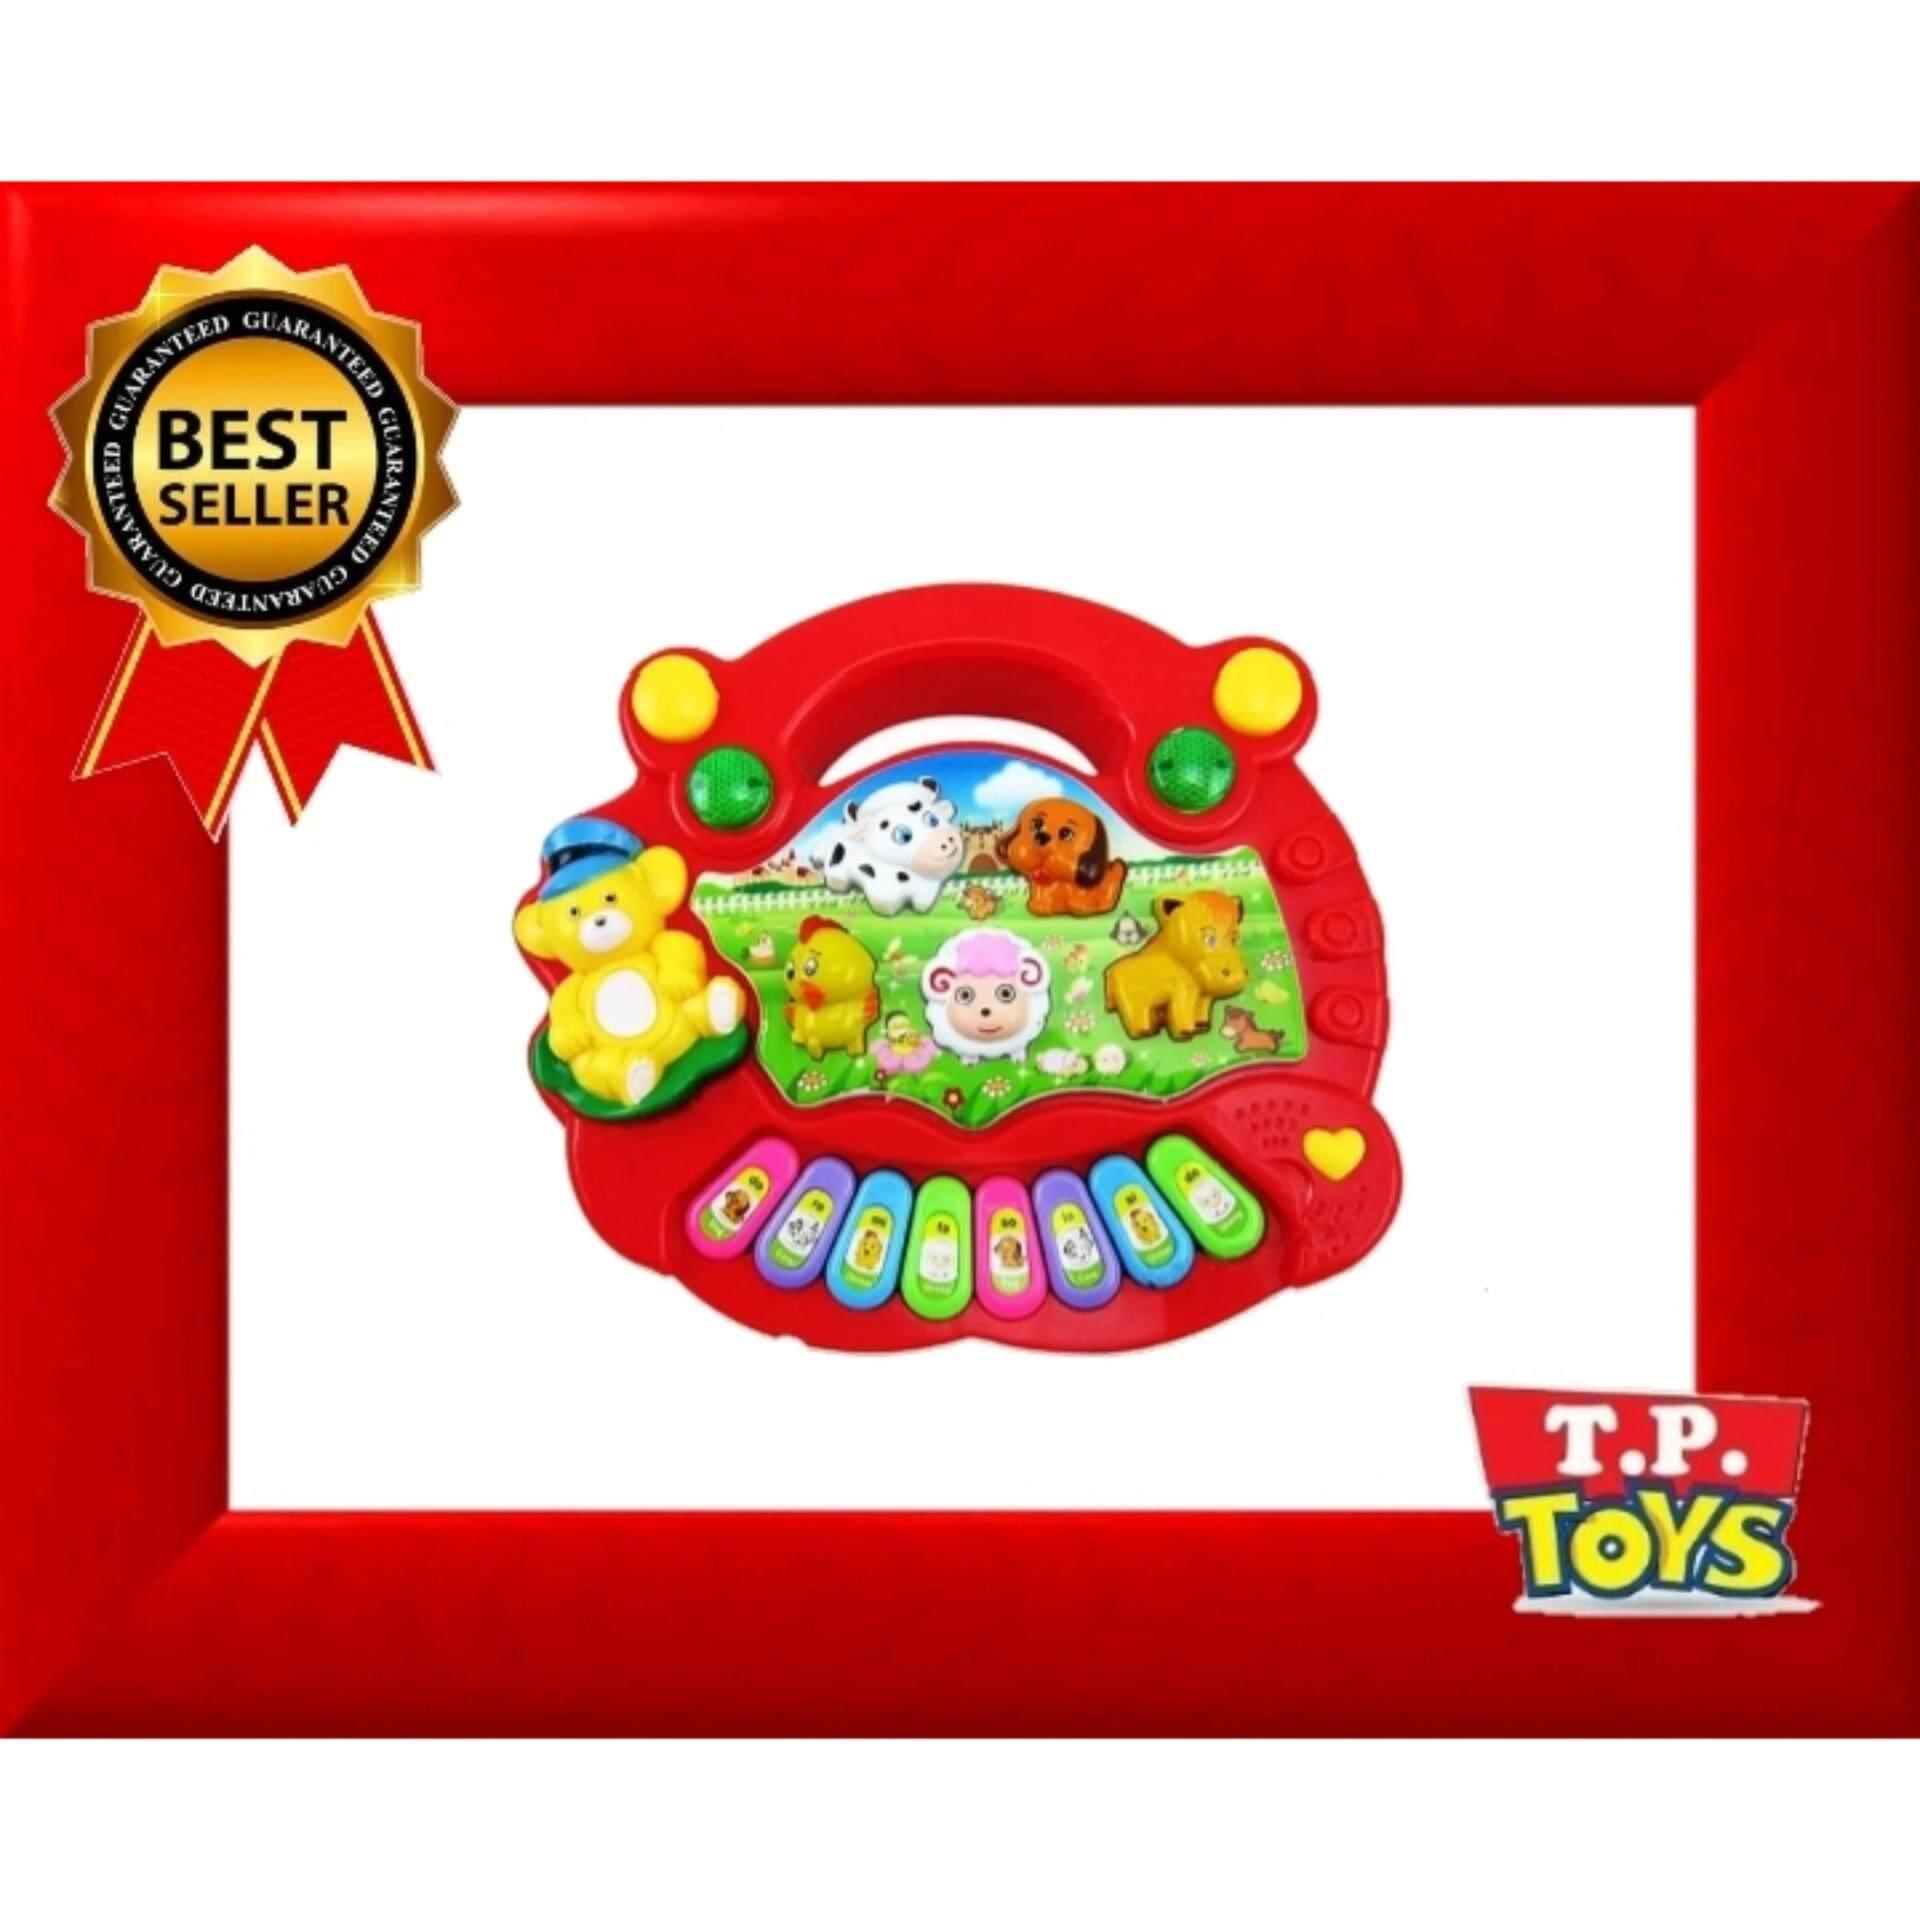 T.p. Toys Animal Farm Paino ออร์แกนมินิเสียงสัตว์ (สีแดง) By T.p. Toys.